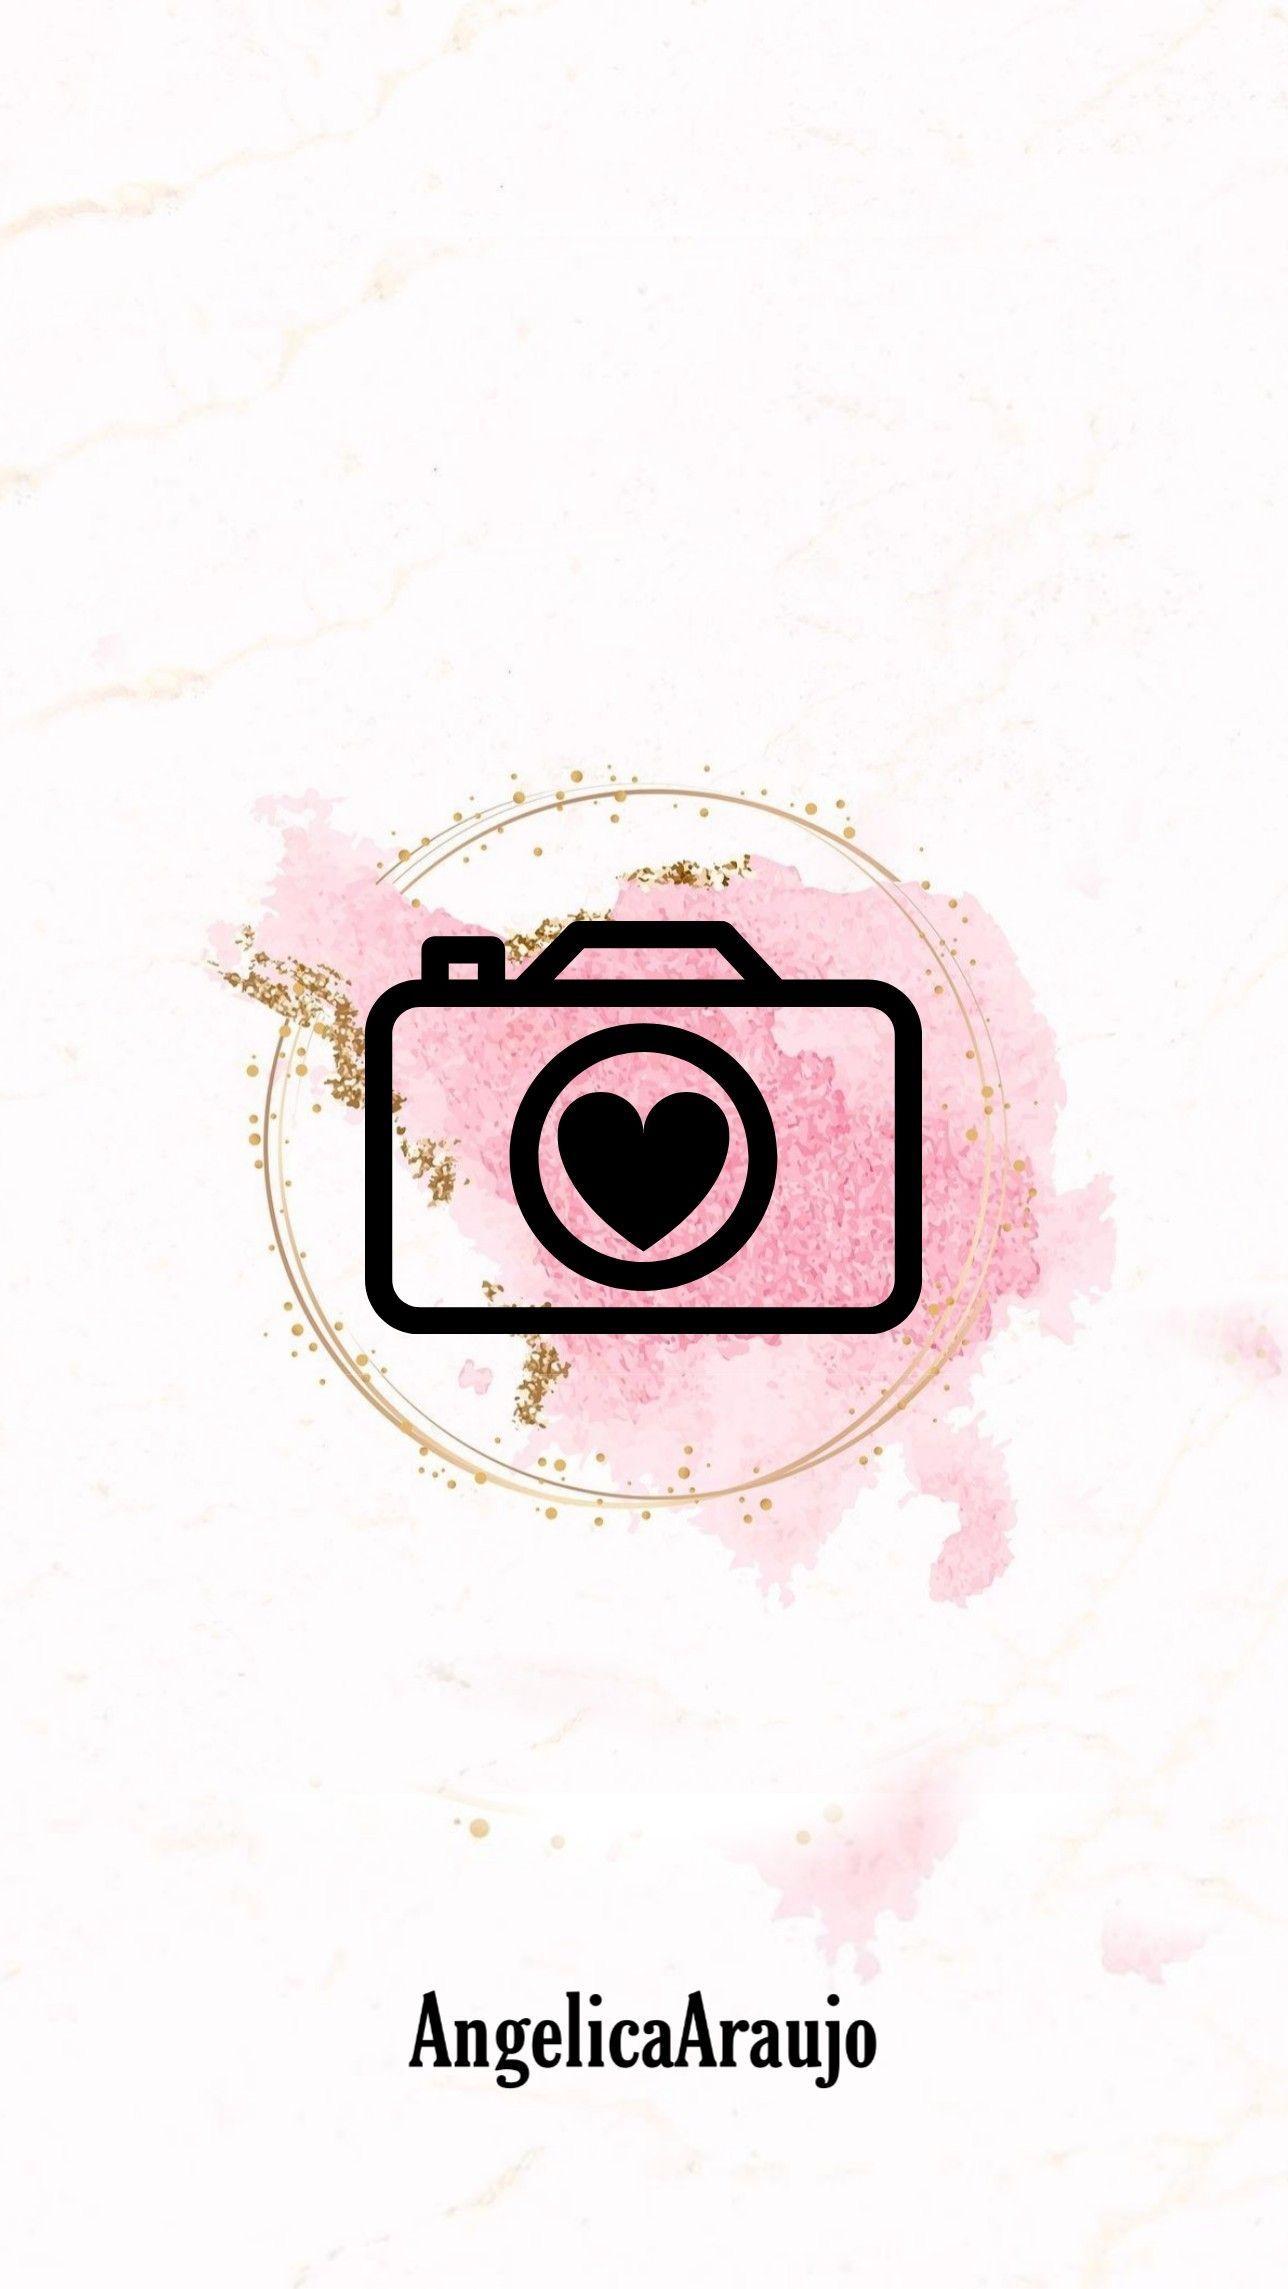 Pin by هند ÙÙد on اطار in 2020 Instagram logo